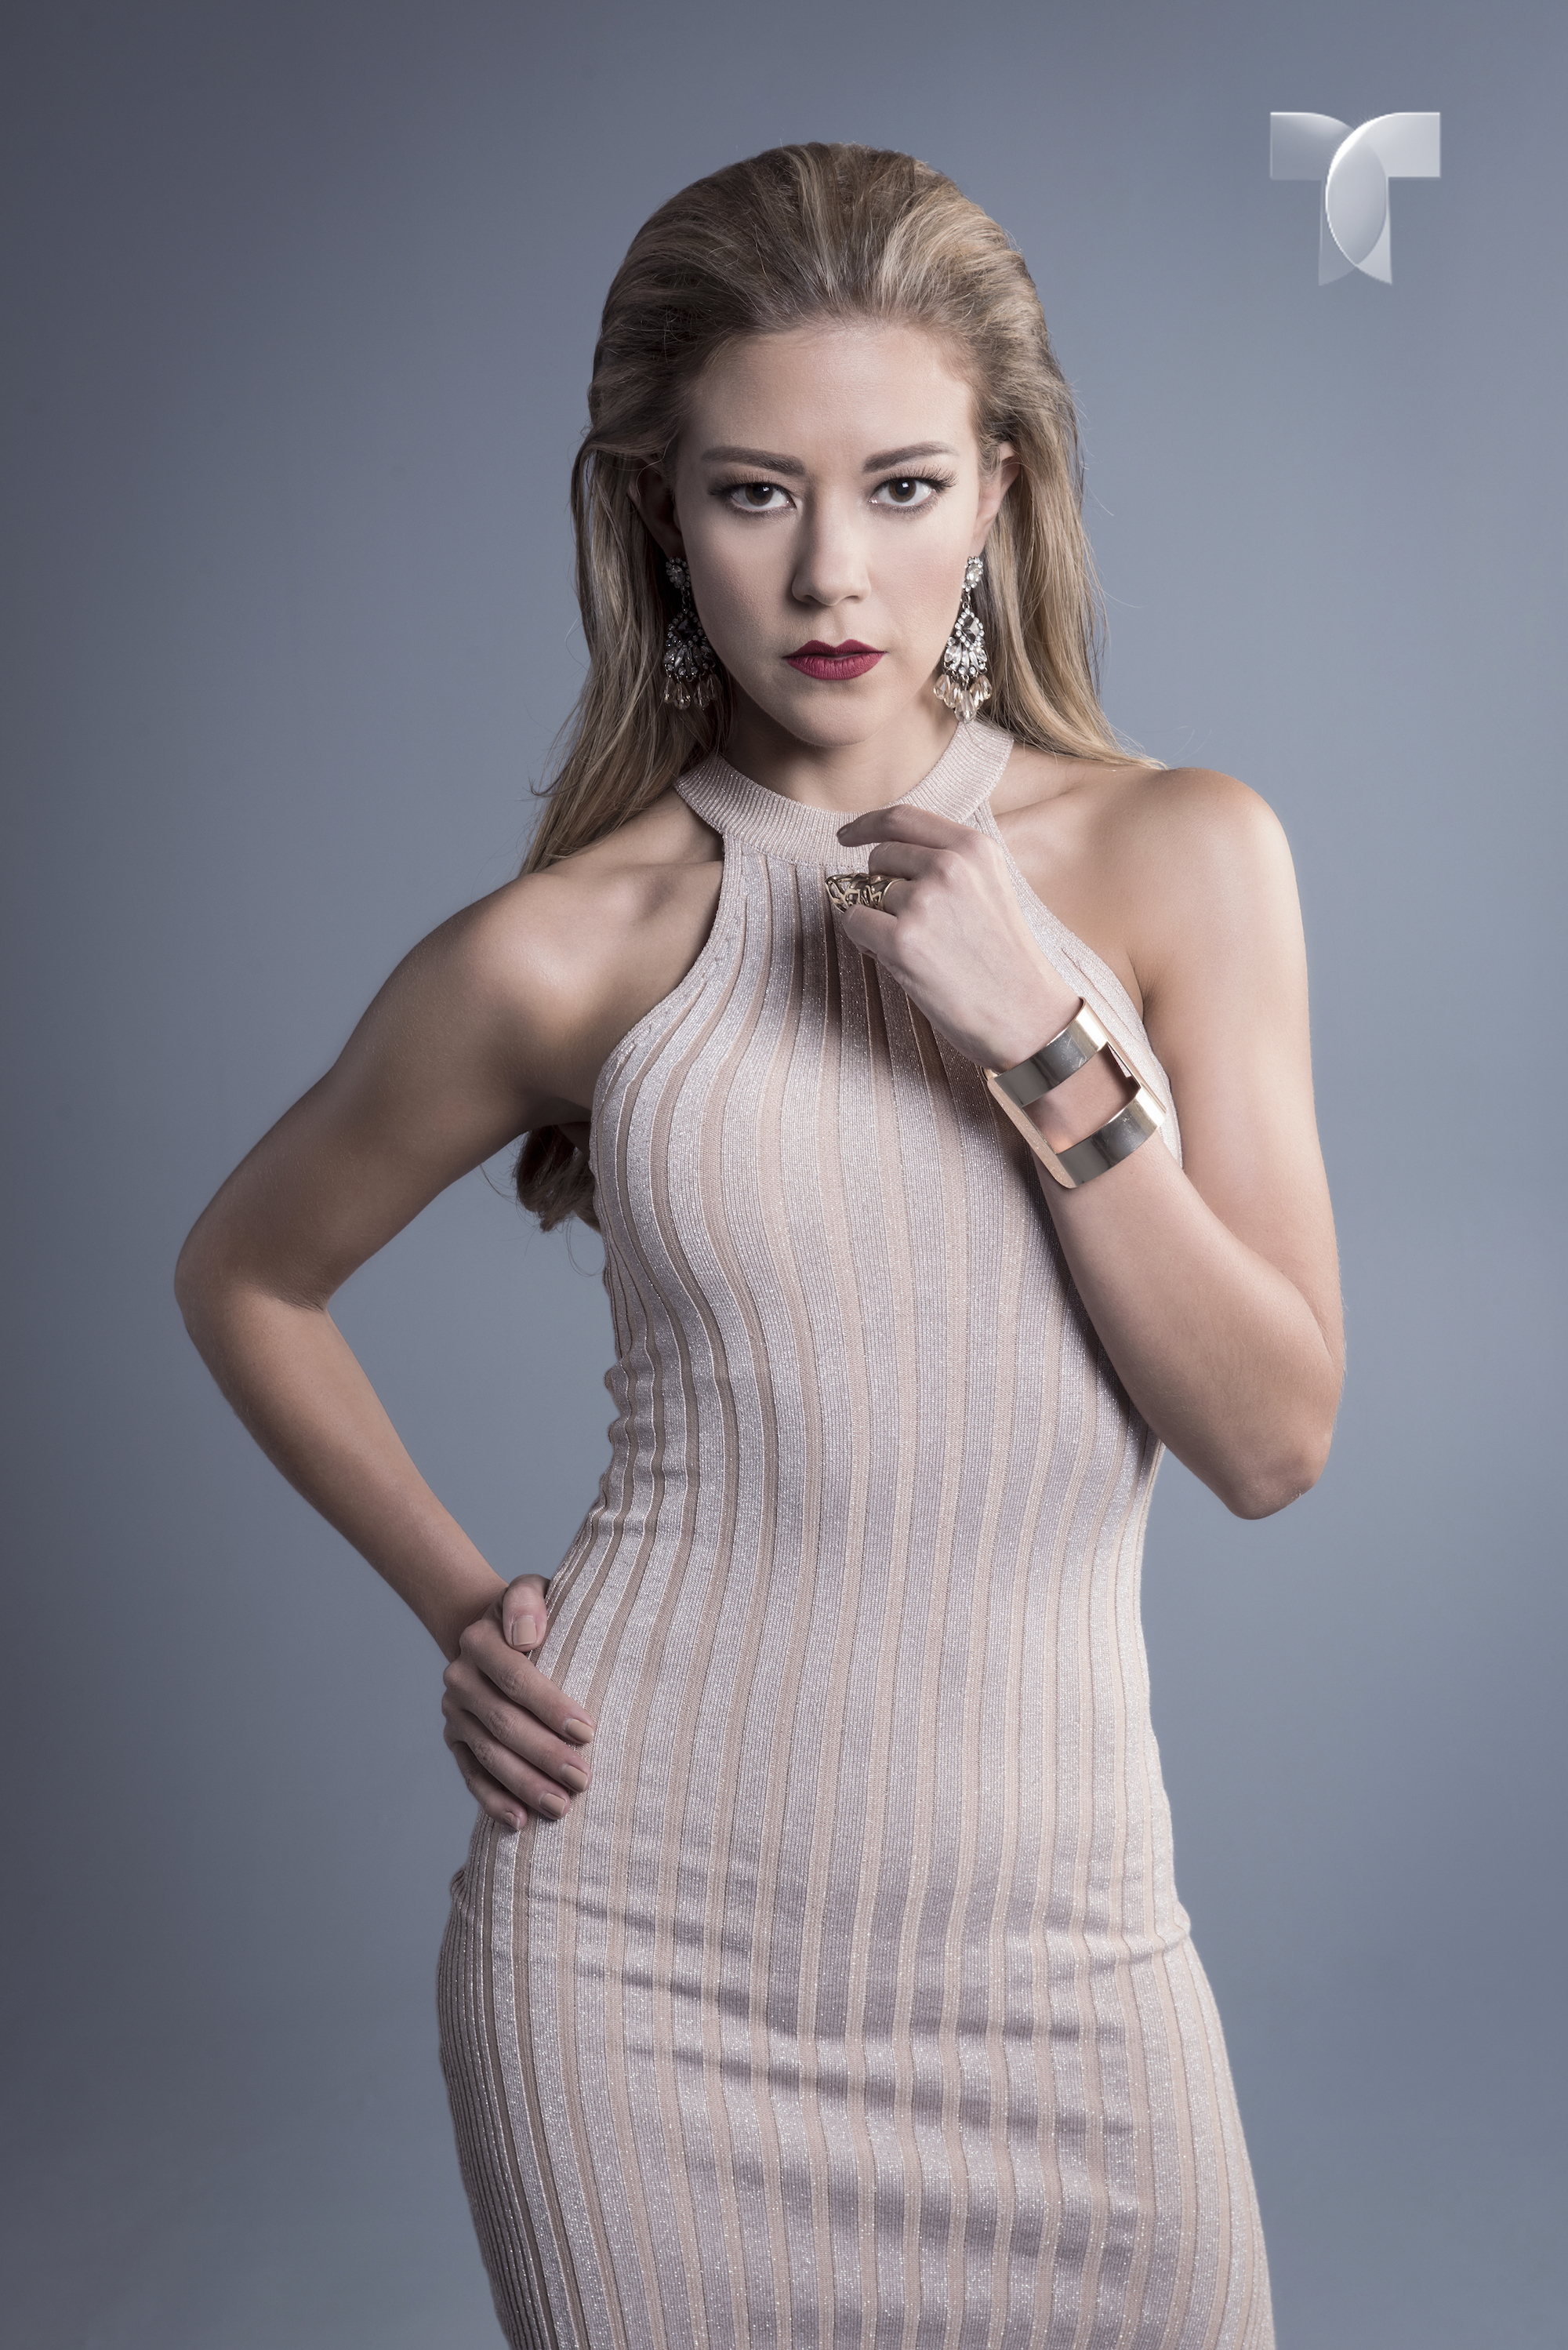 _ESDLC_Fernanda Castillo como Monica Robles_006 copy copia